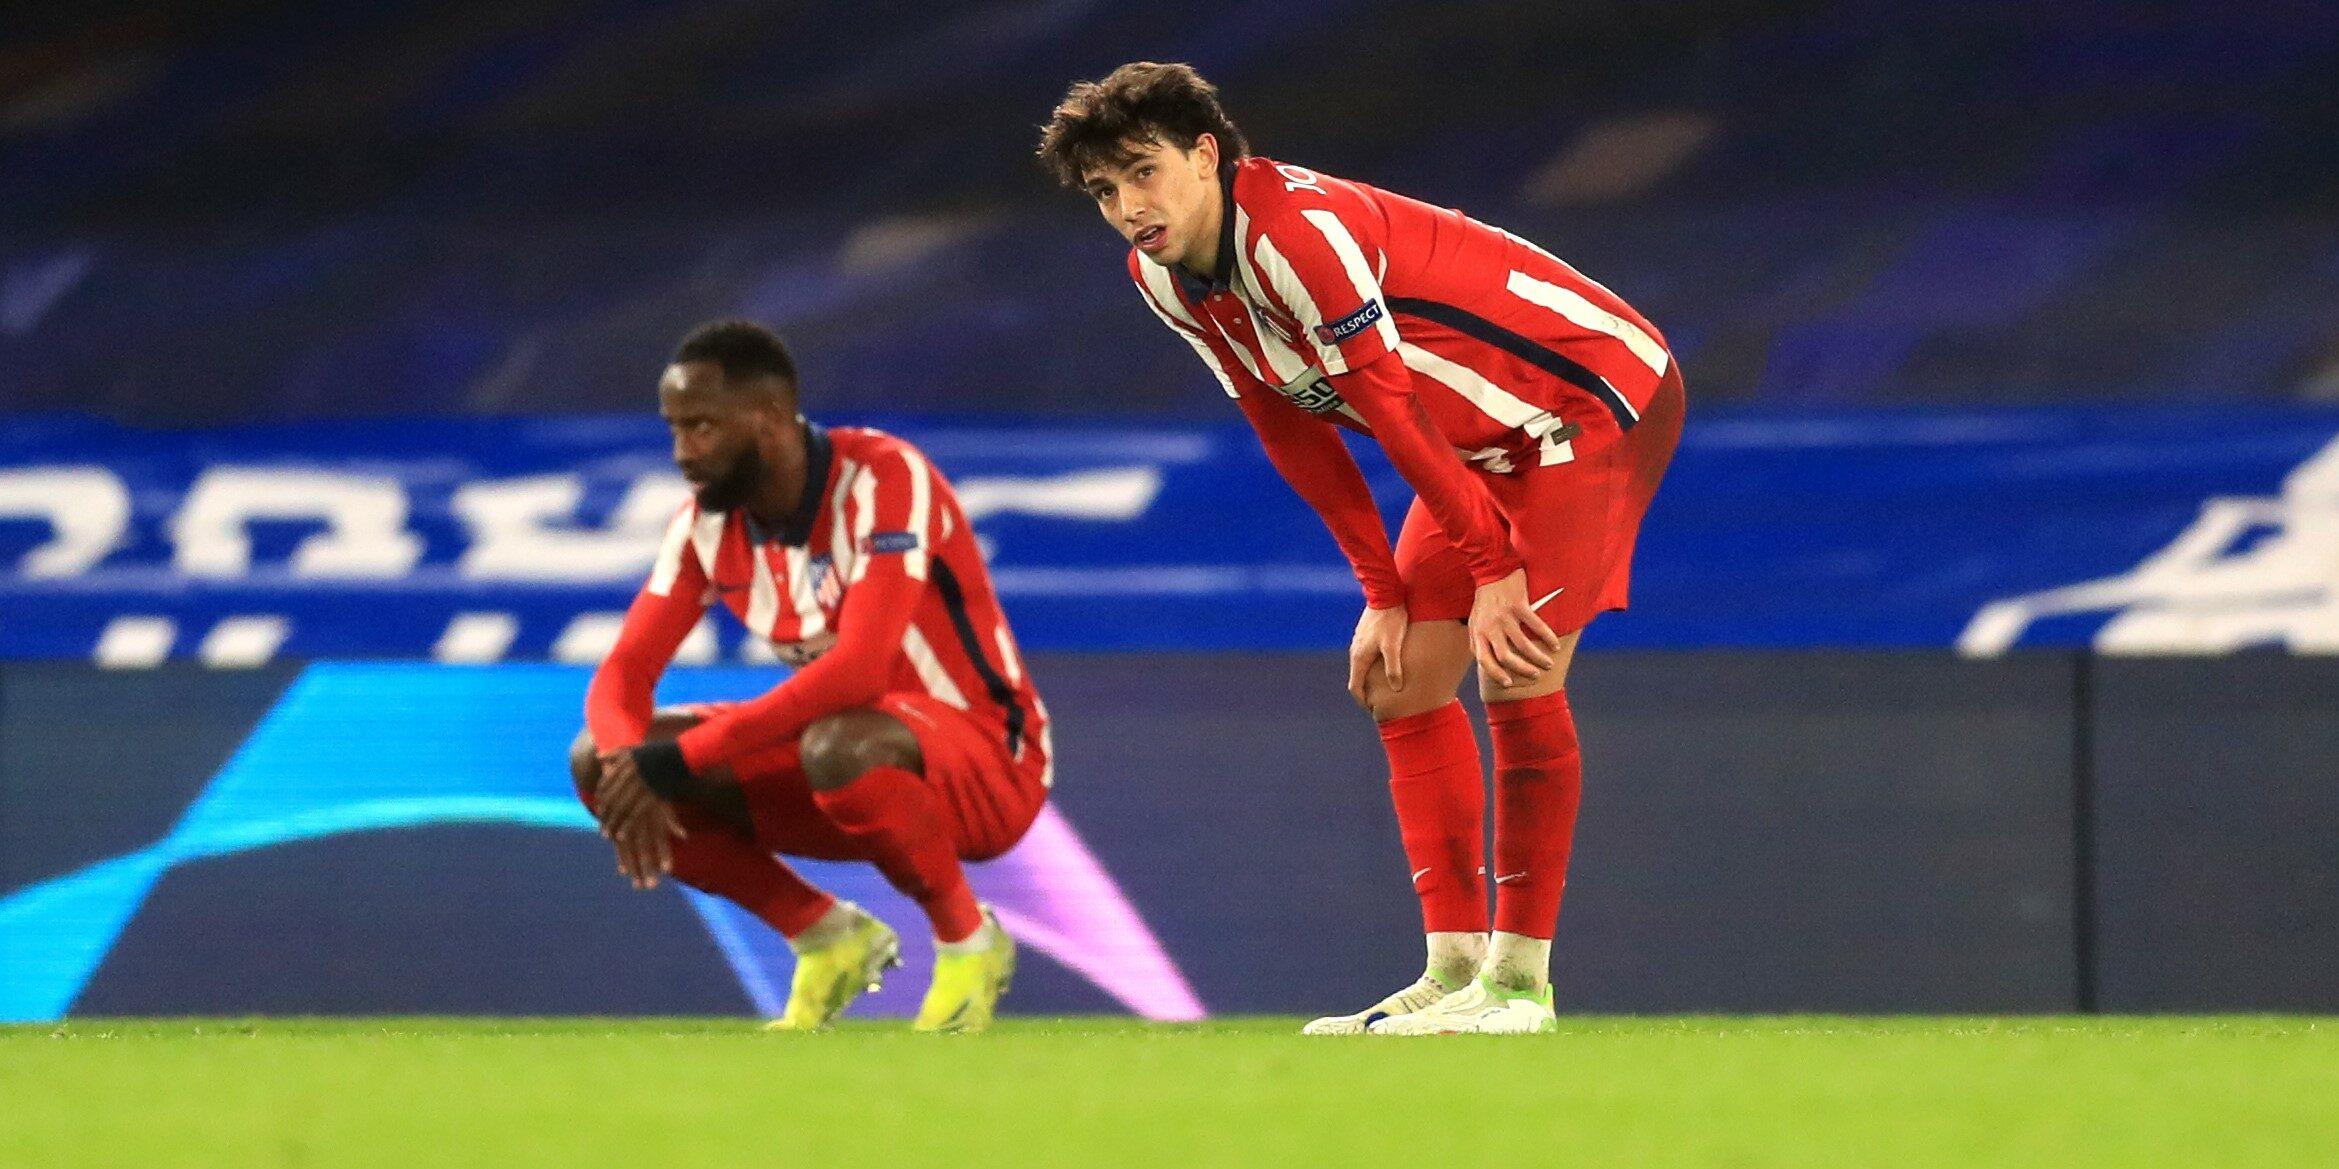 Joao Felix i Lemar, a Stamford Bridge | Europa Press